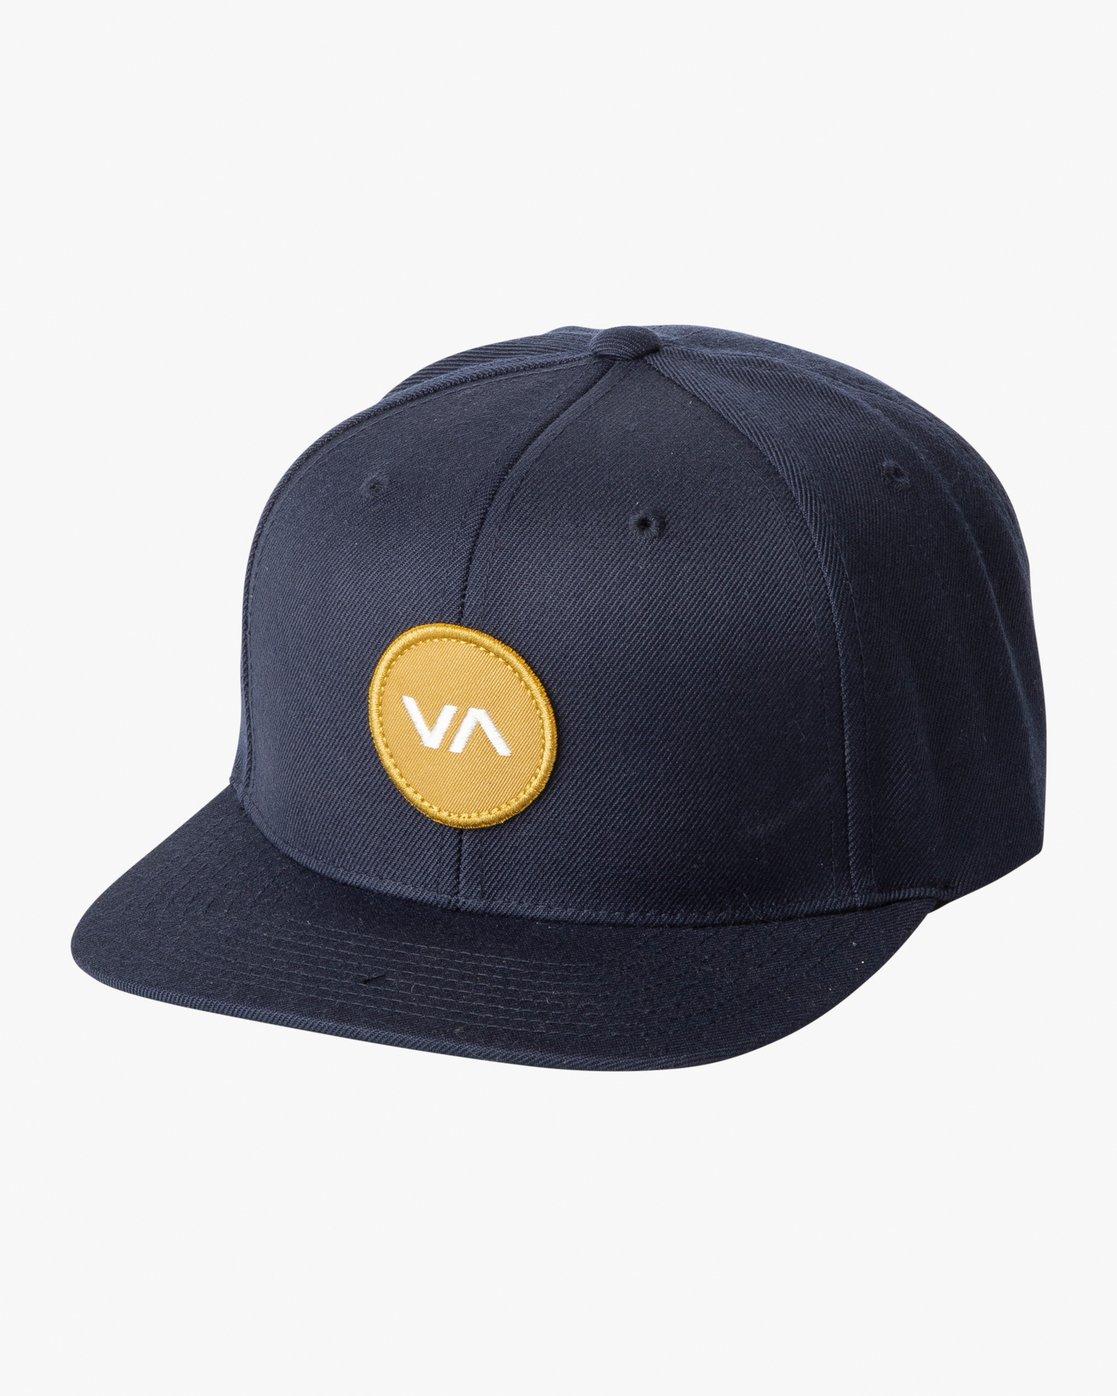 0 VA Patch Snapback Hat Brown MAHWVRVP RVCA